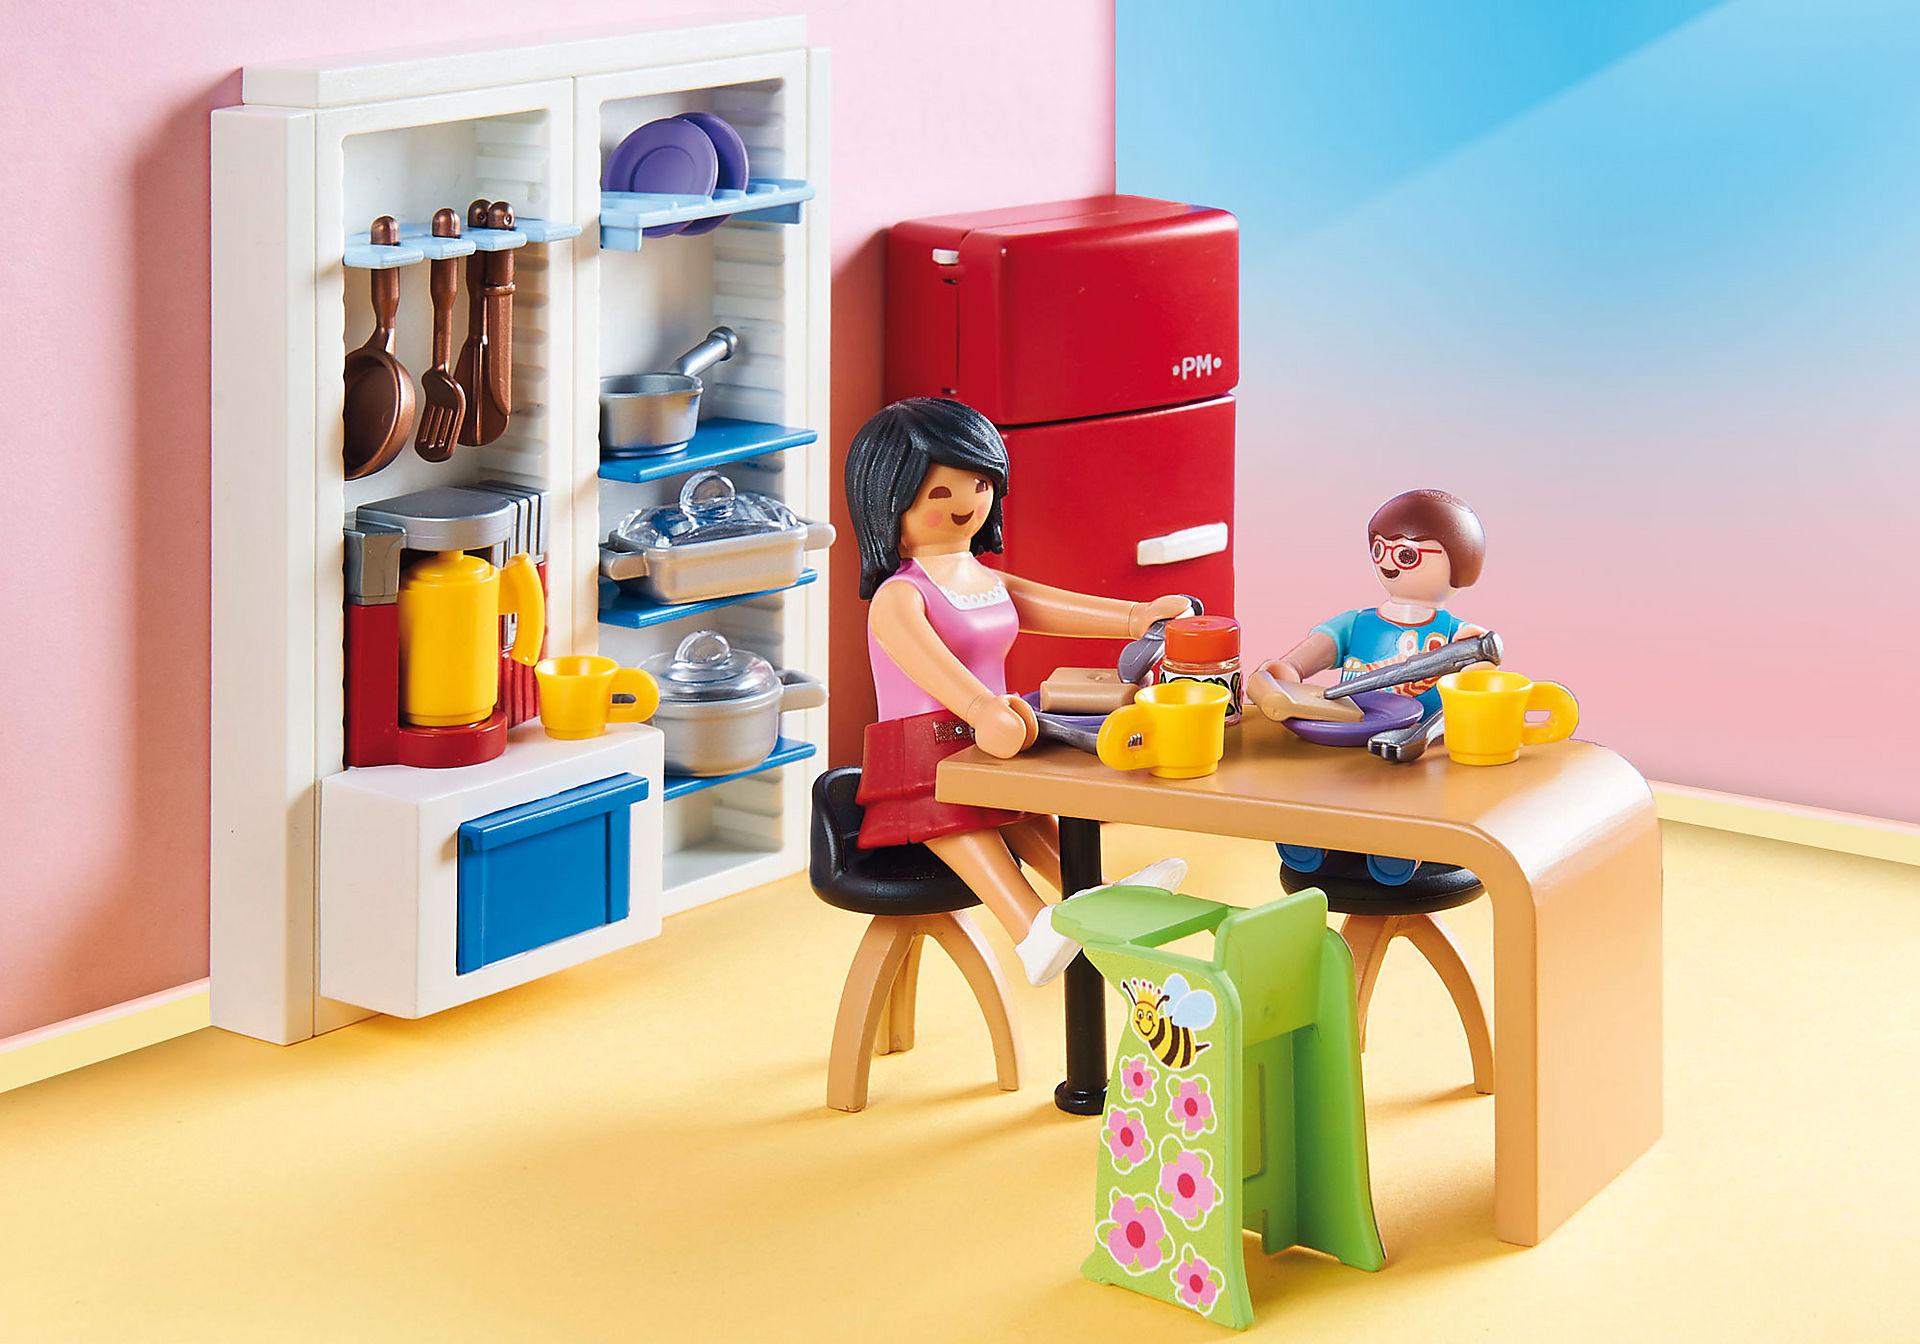 70206 Family Kitchen zoom image5